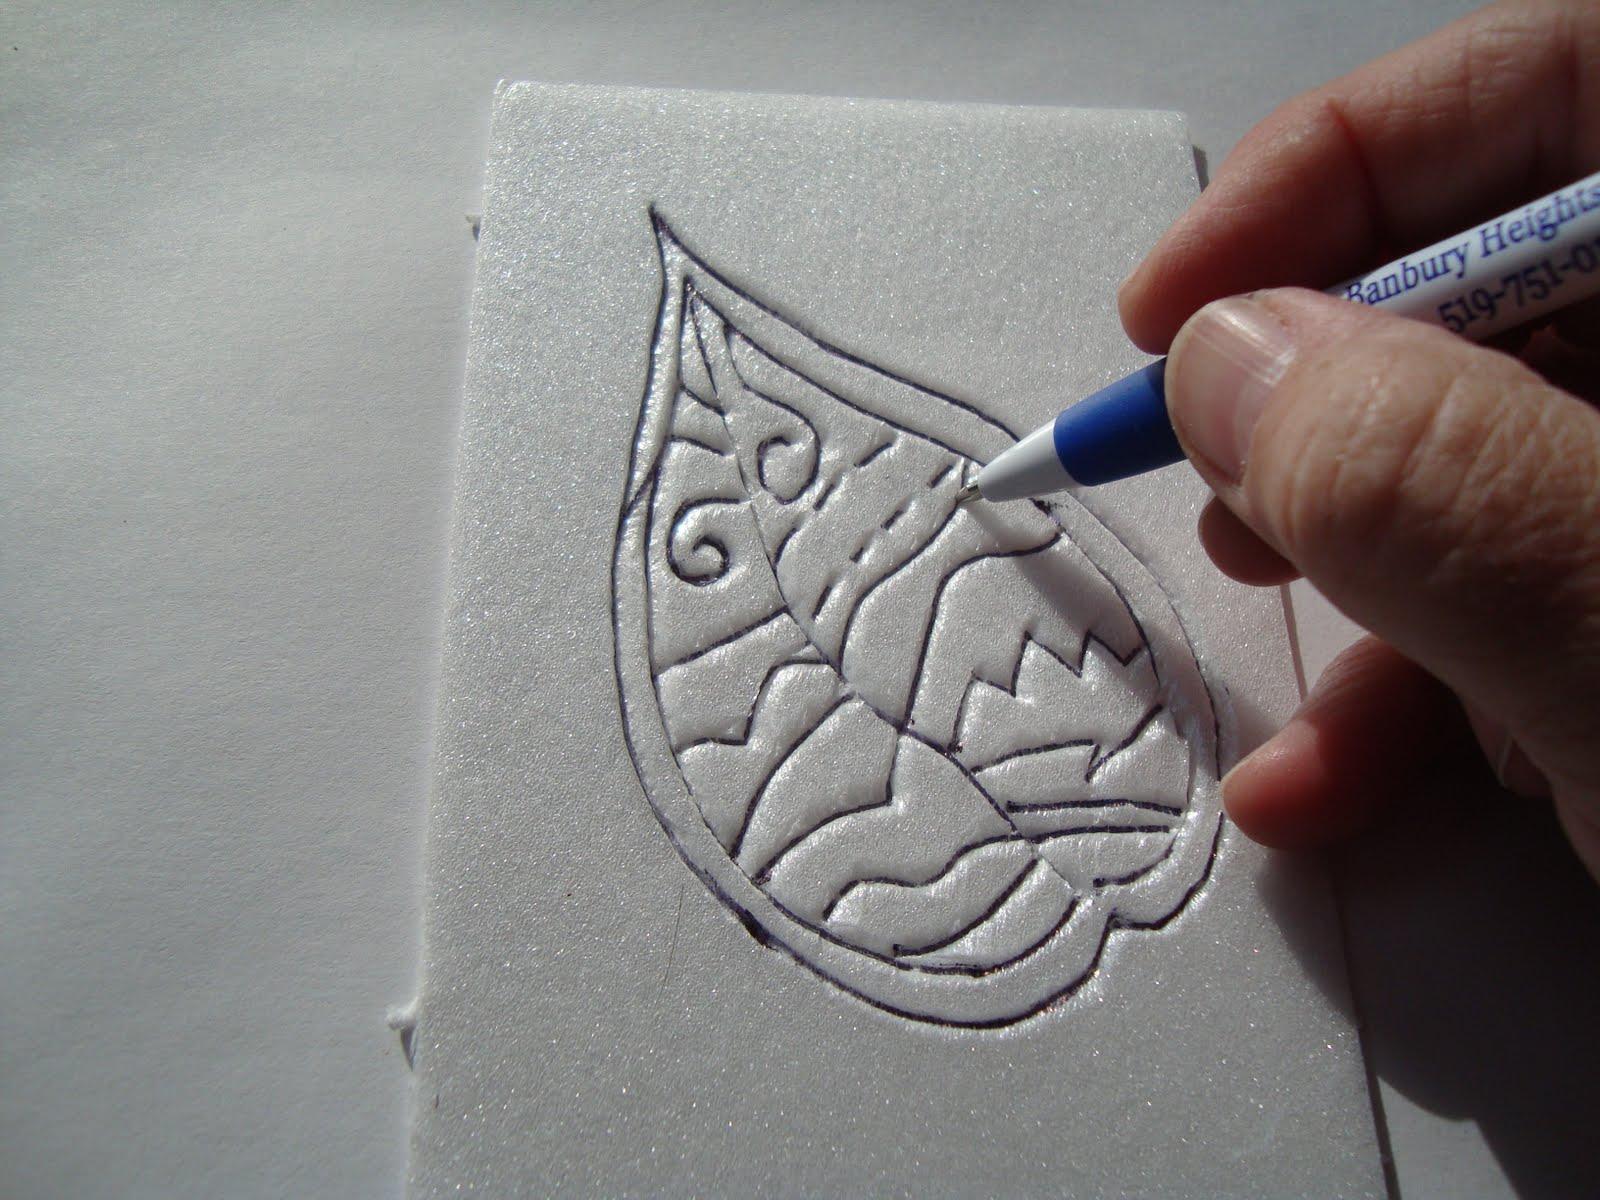 Acrylic Paint For Printmaking